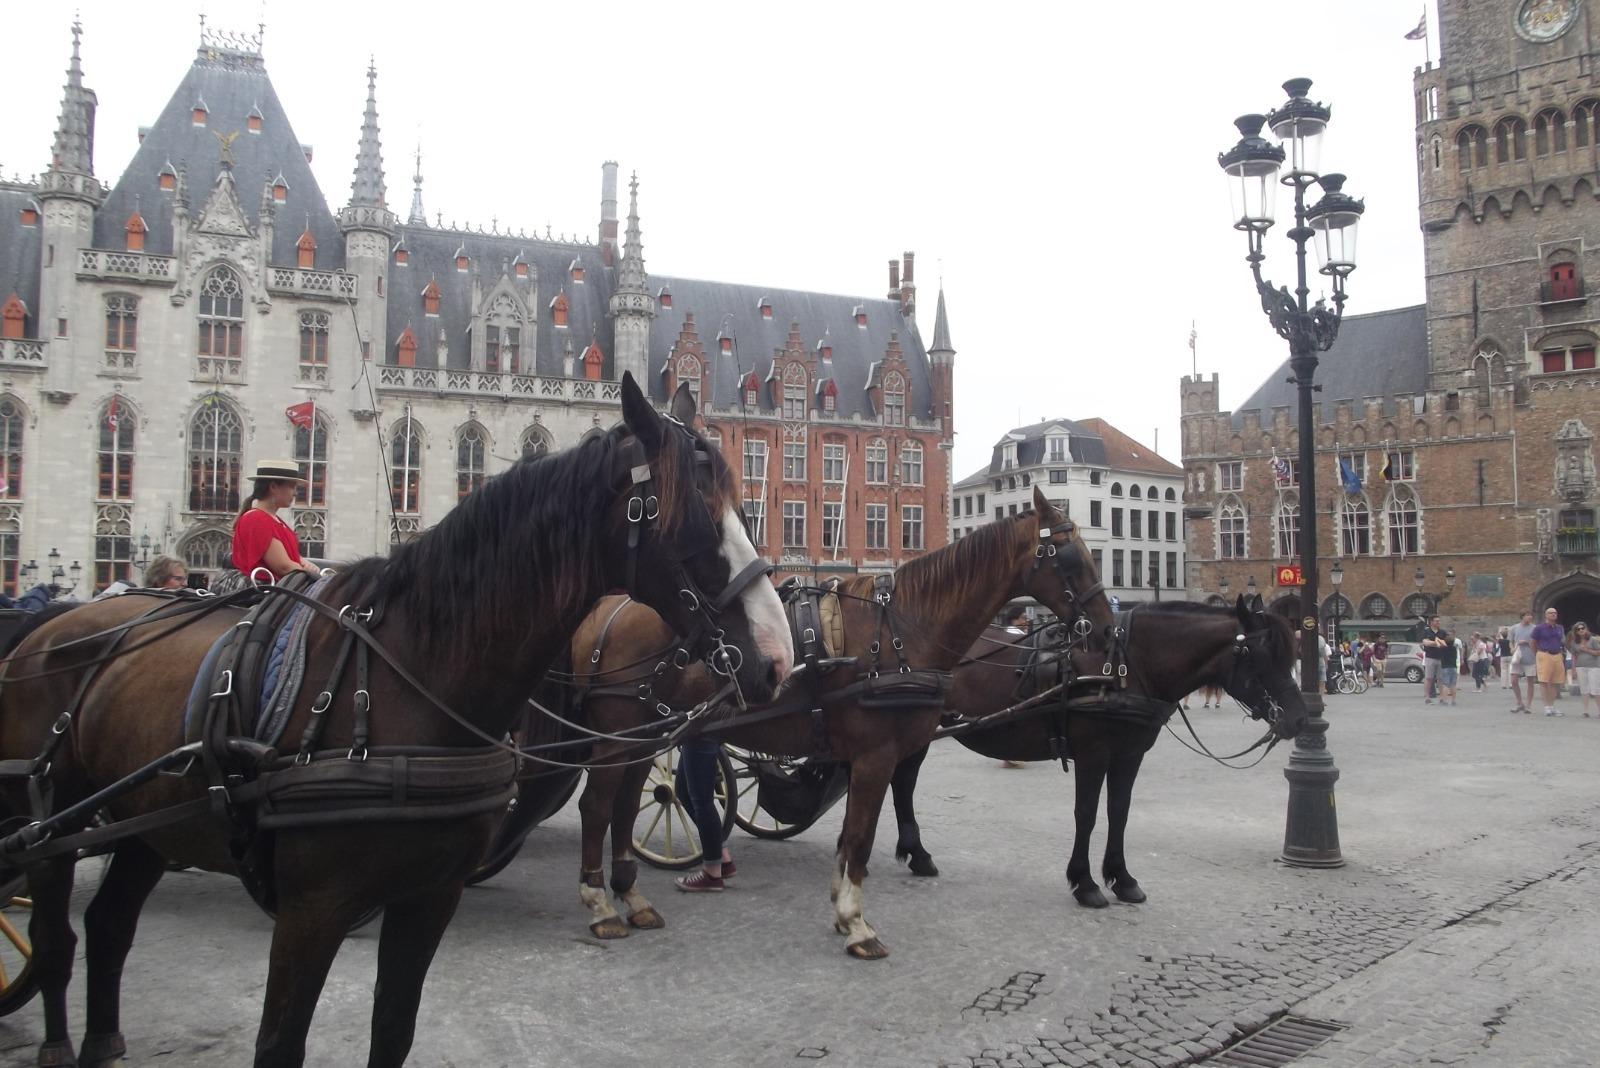 belgioelussemburgo30-1600418908.jpg